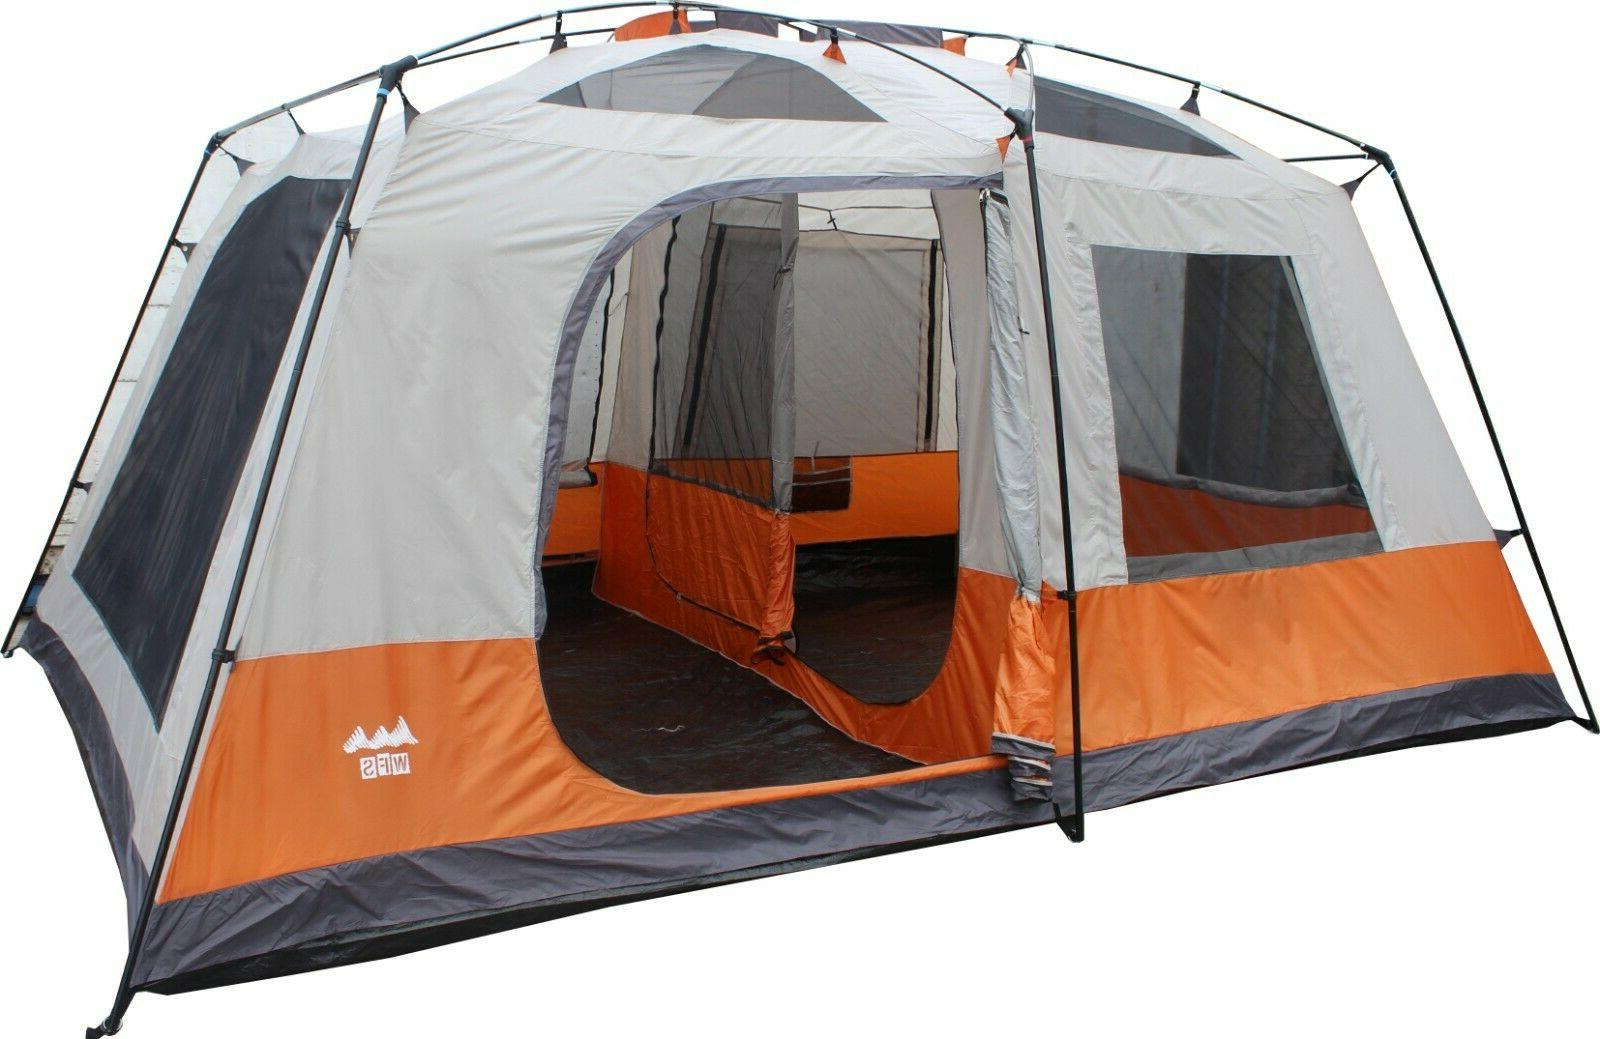 8 person 2 room cabin tent 15